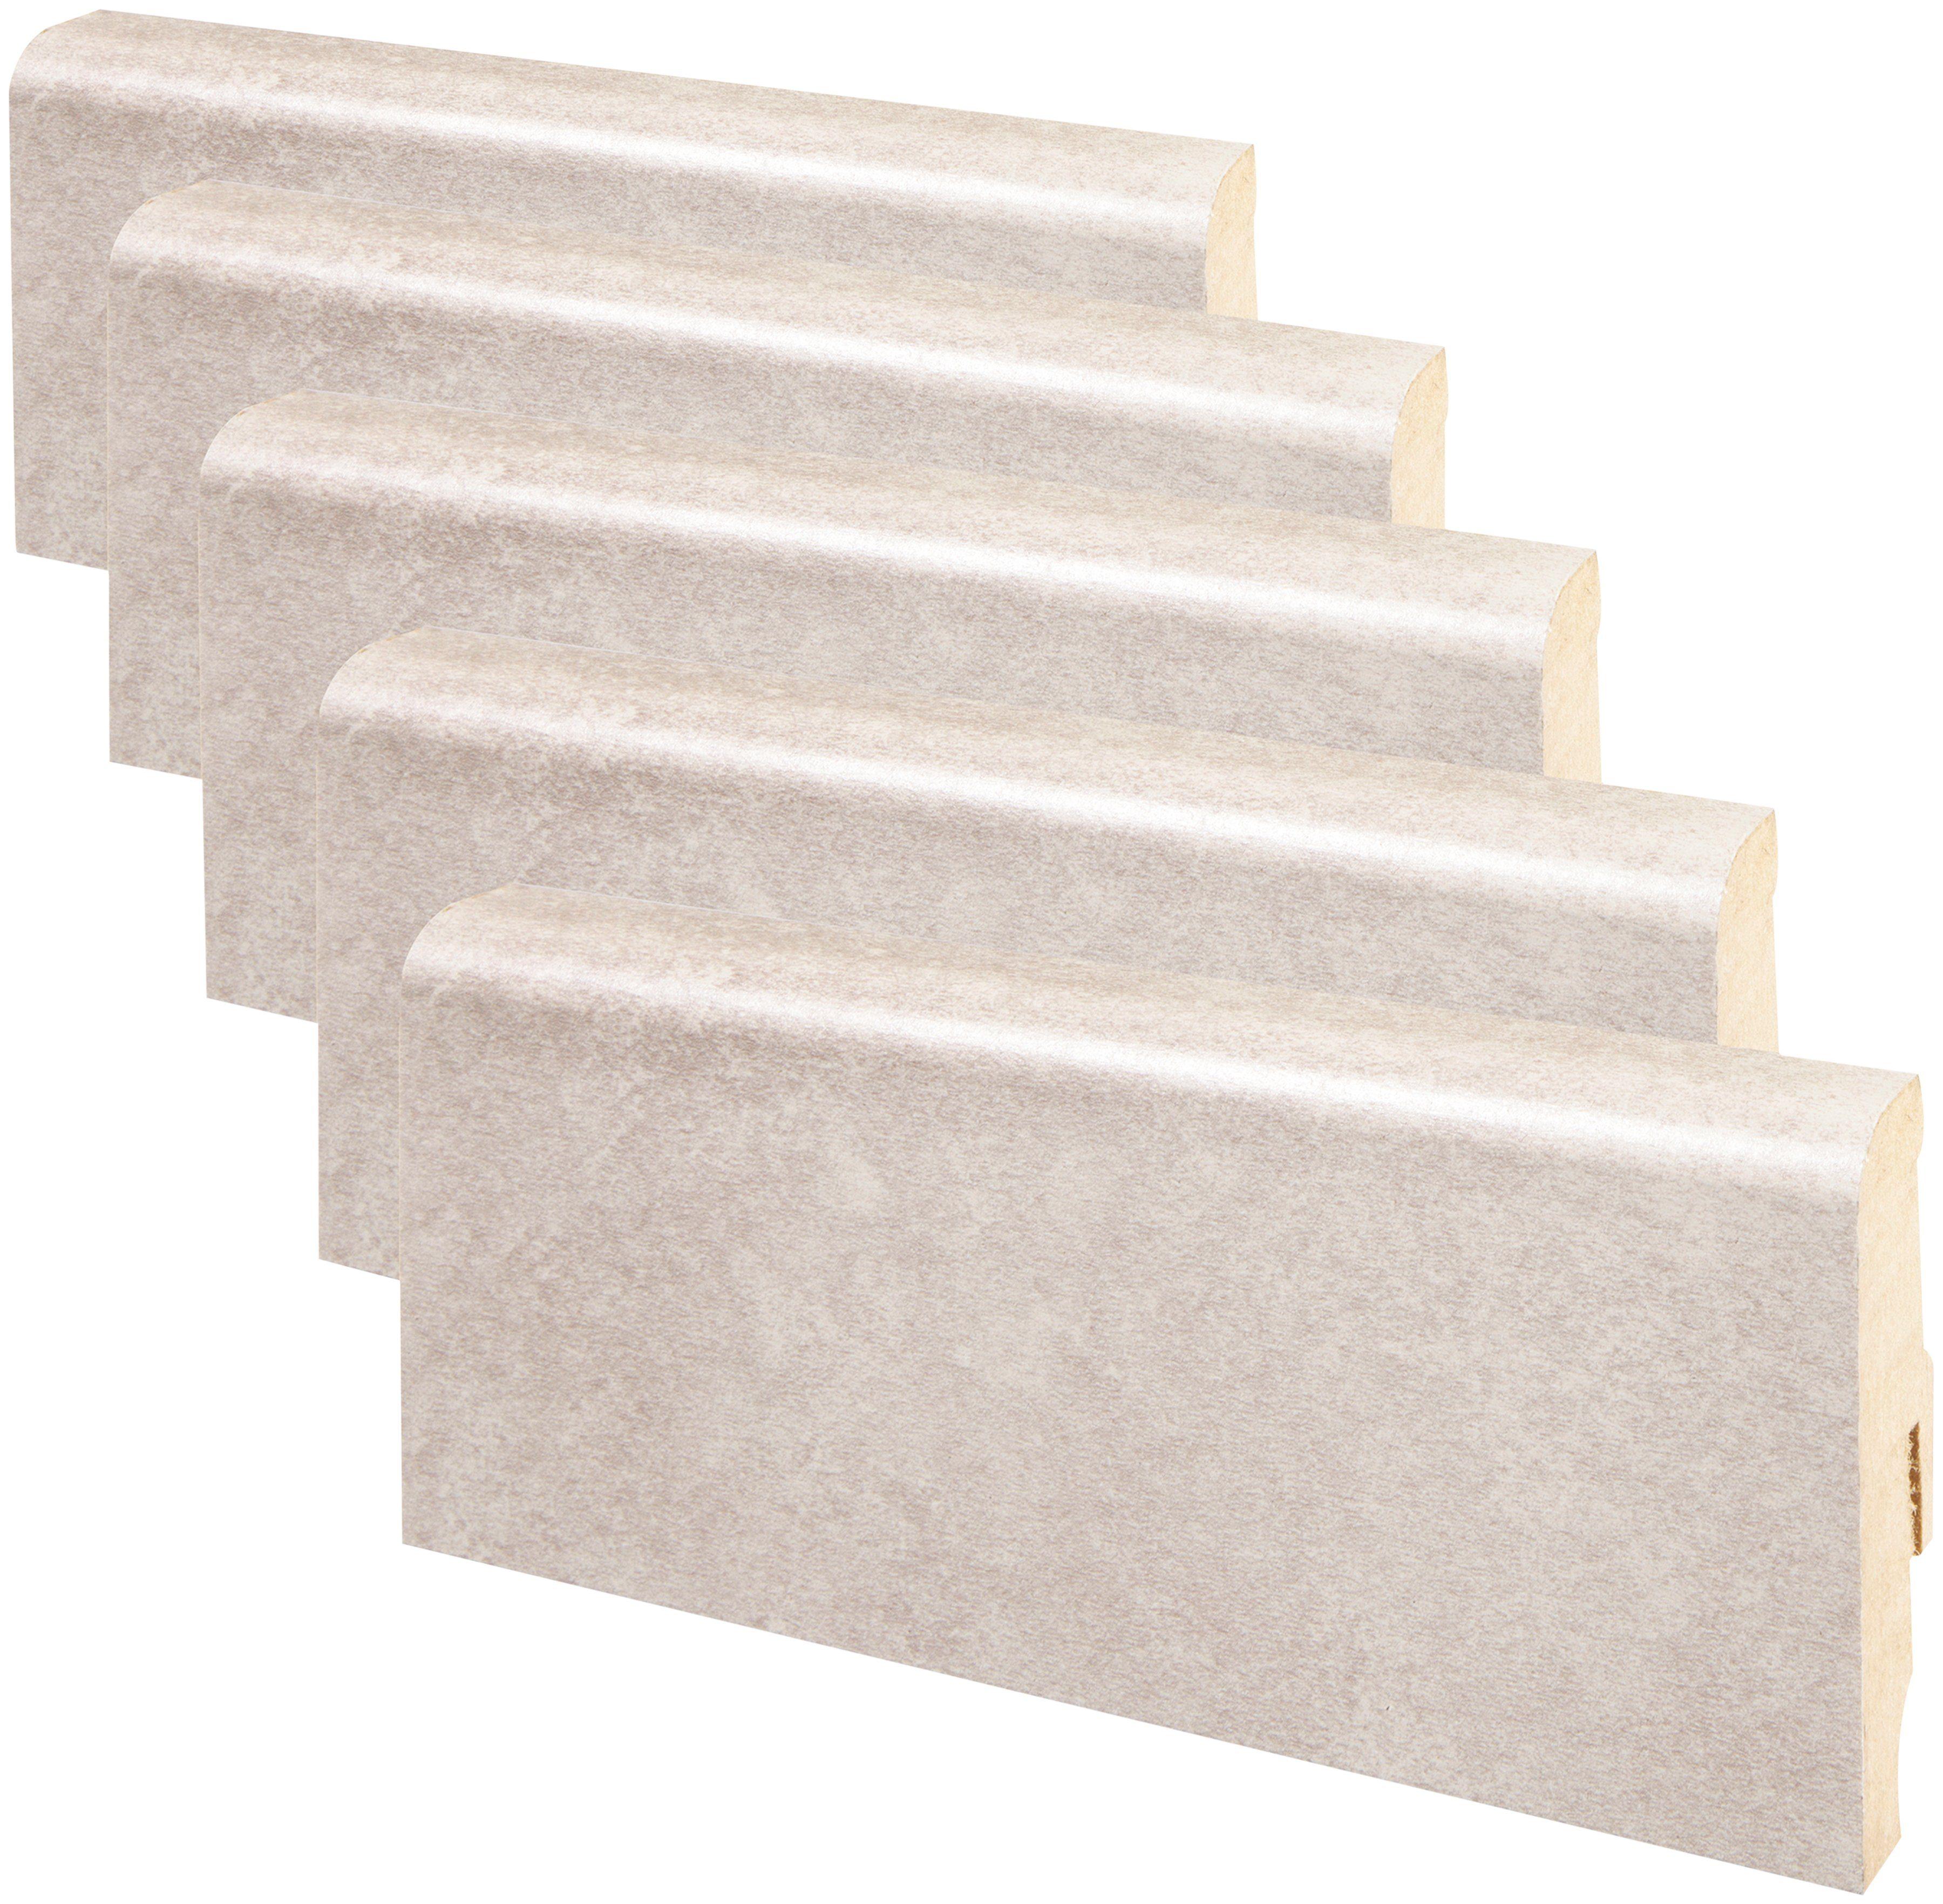 MODERNA Sockelleiste »Designfußleiste DFL 60 - Sandstein«, 5er-Pack, Höhe: 6 cm